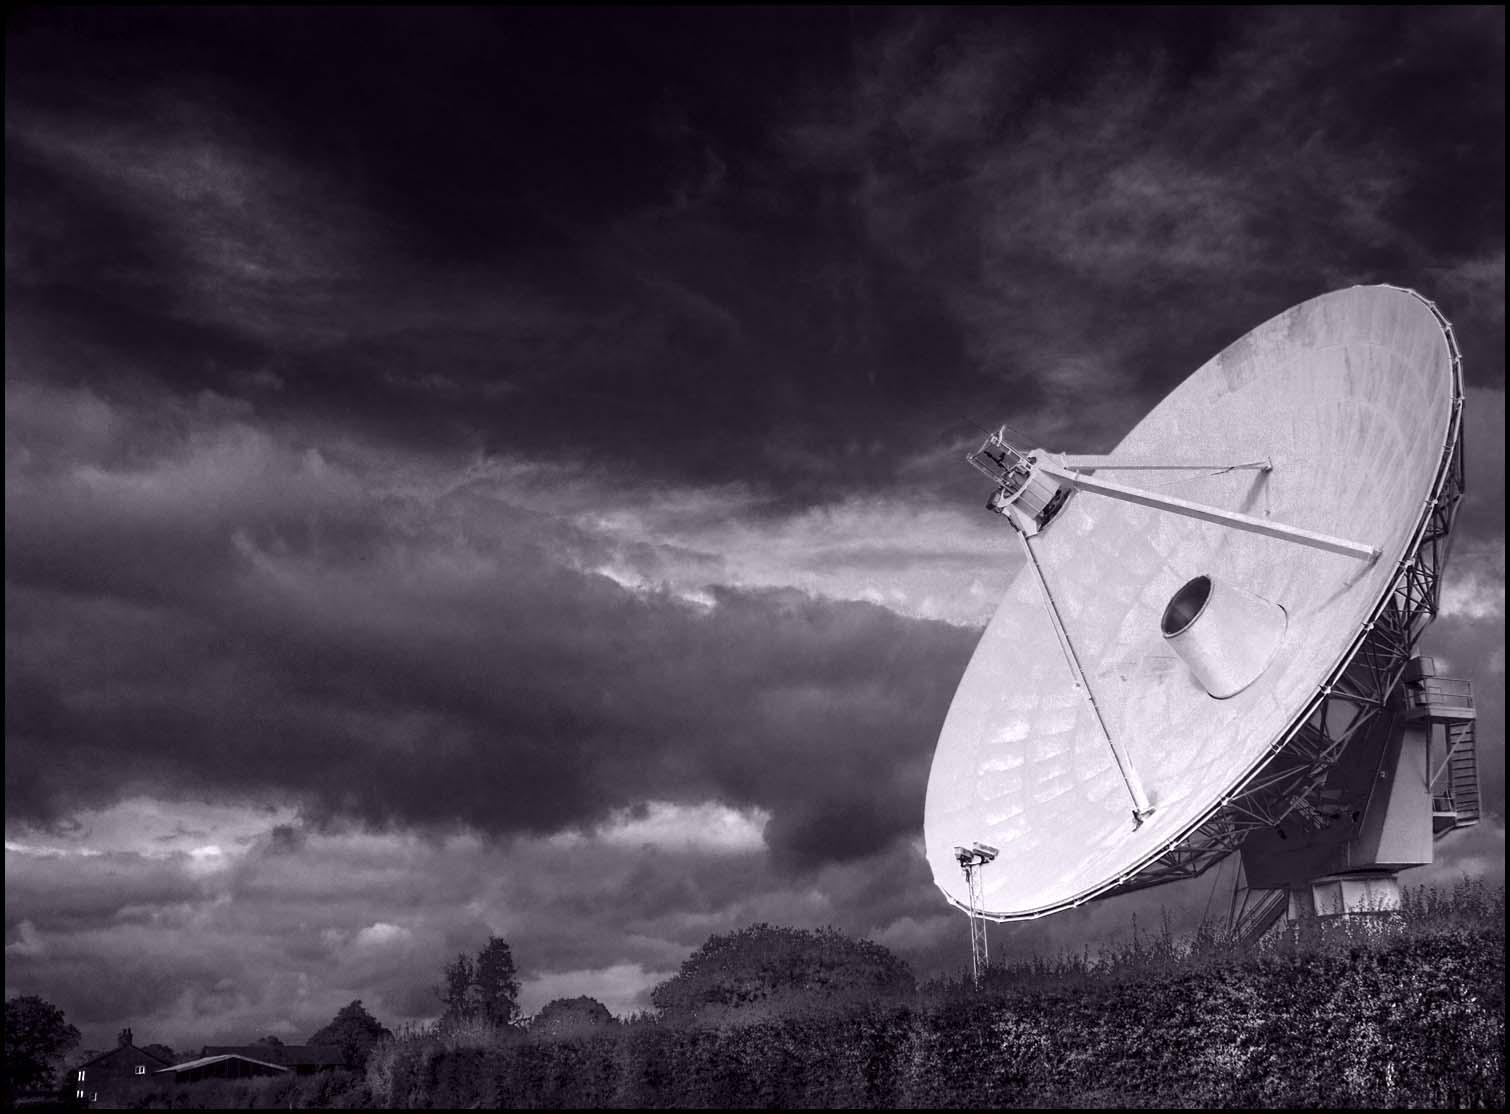 Plumley,Cheshire,England,UK,radio,telescope,countryside,A556,black,white,toned,tinted,mono,monochrome,disk,sky,365days,hotpix.org.uk,www.hotpix.org.uk,B/W,this photo rocks,HDR,high dynamic range,interesting,place,places,hotpix!